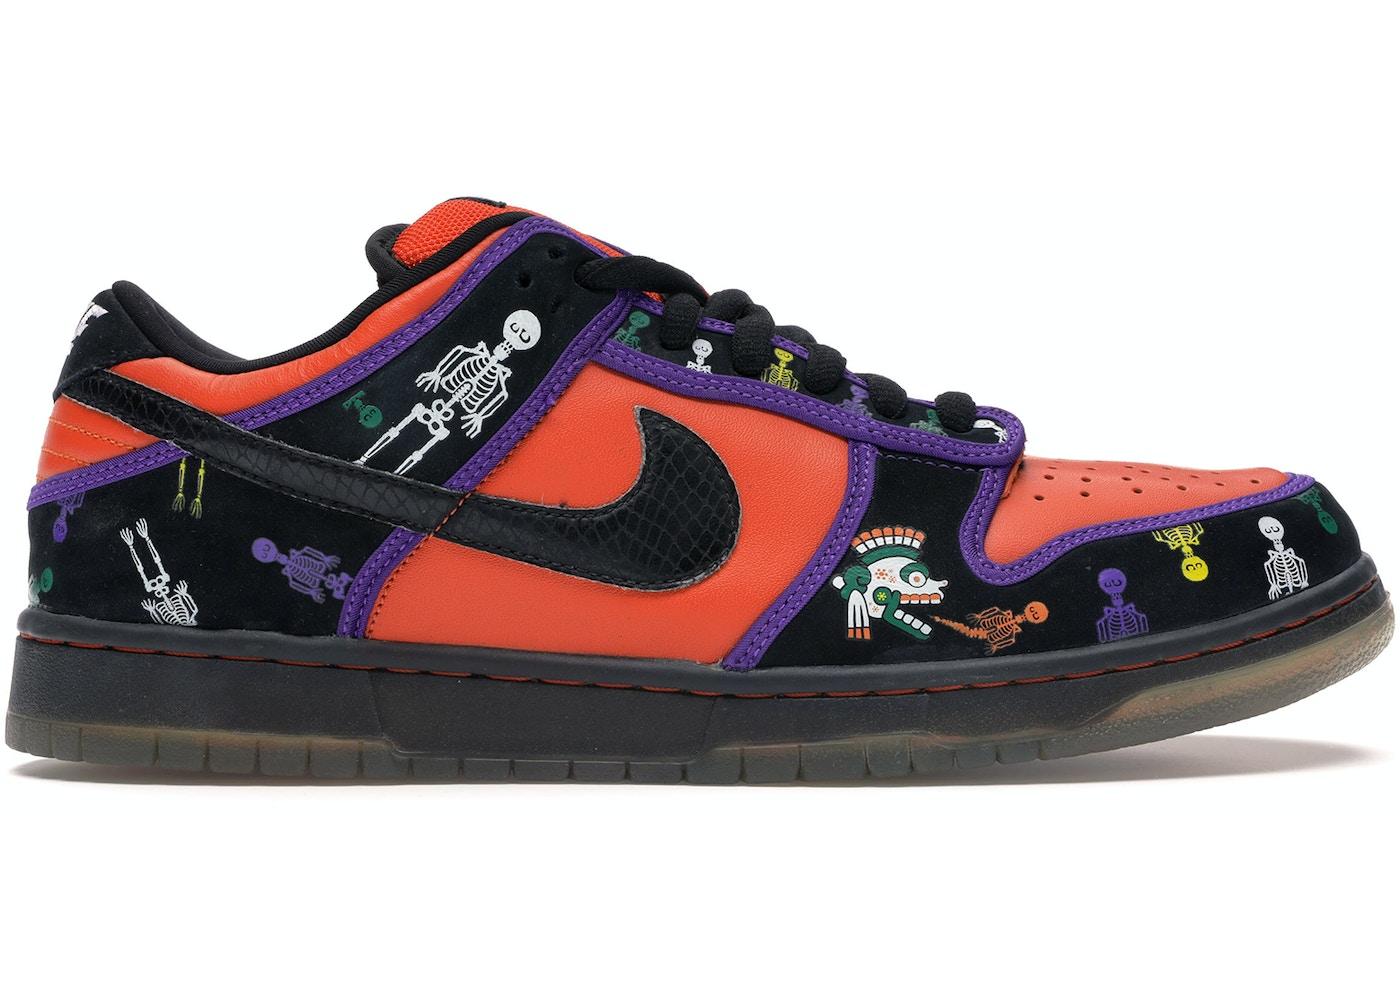 3fa4a03ba Size 6 Shoes - Average Sale Price